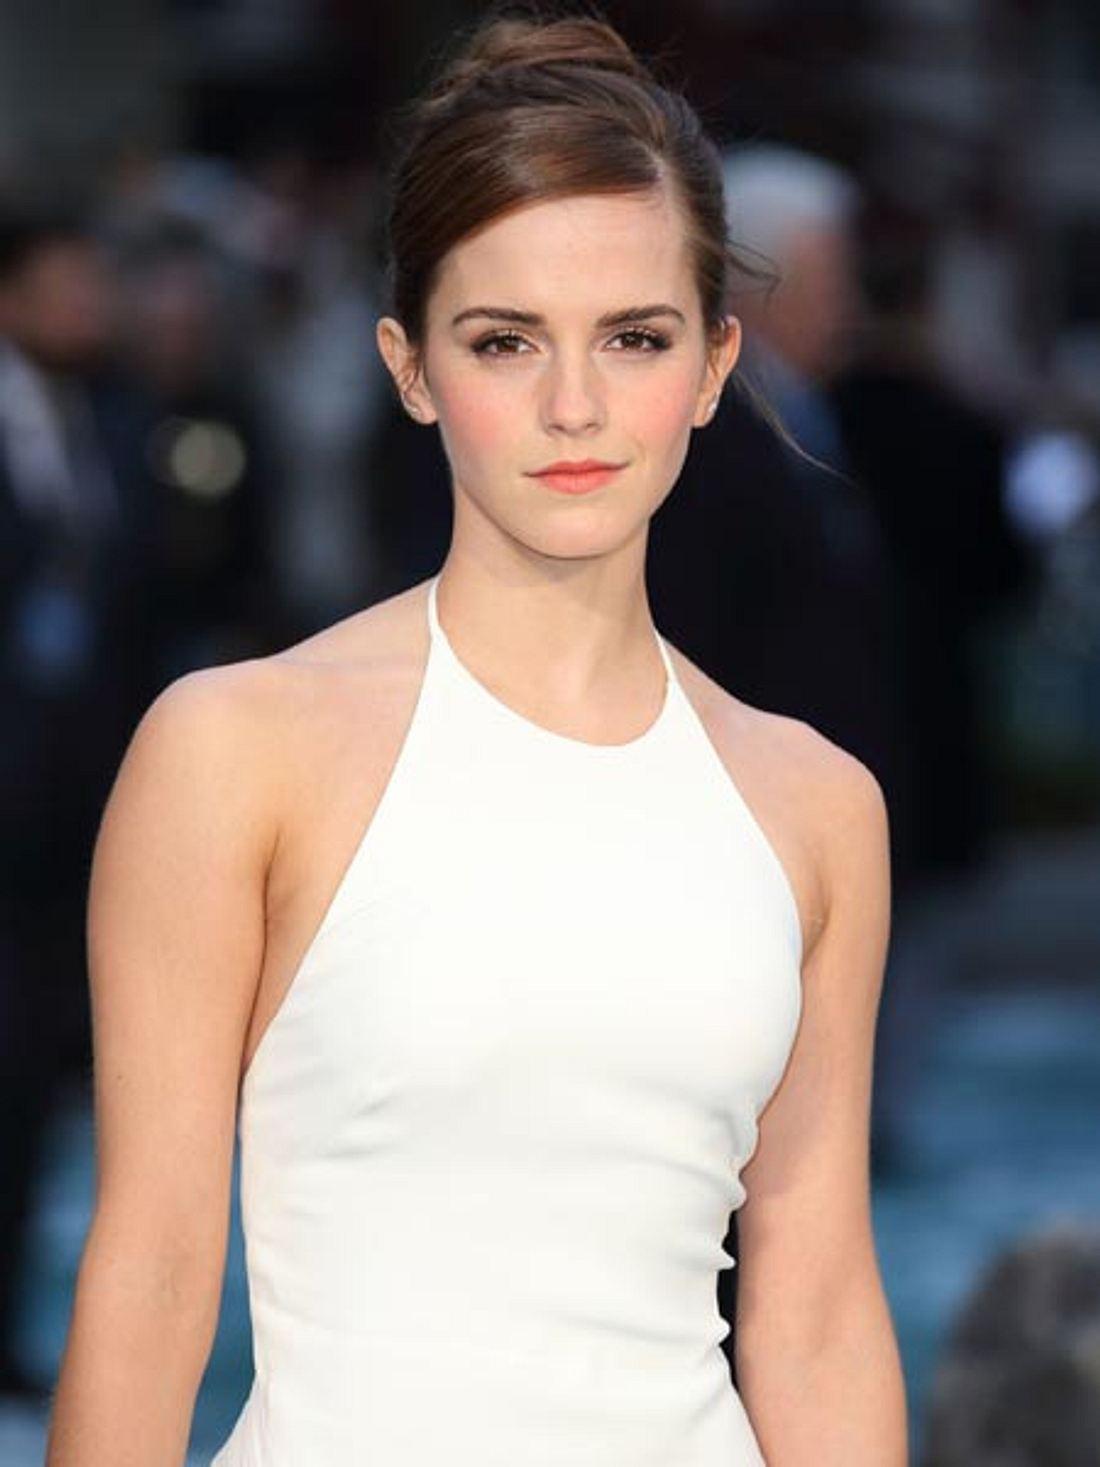 Emma Watson ist zertifizierte Yoga-Lehrerin.